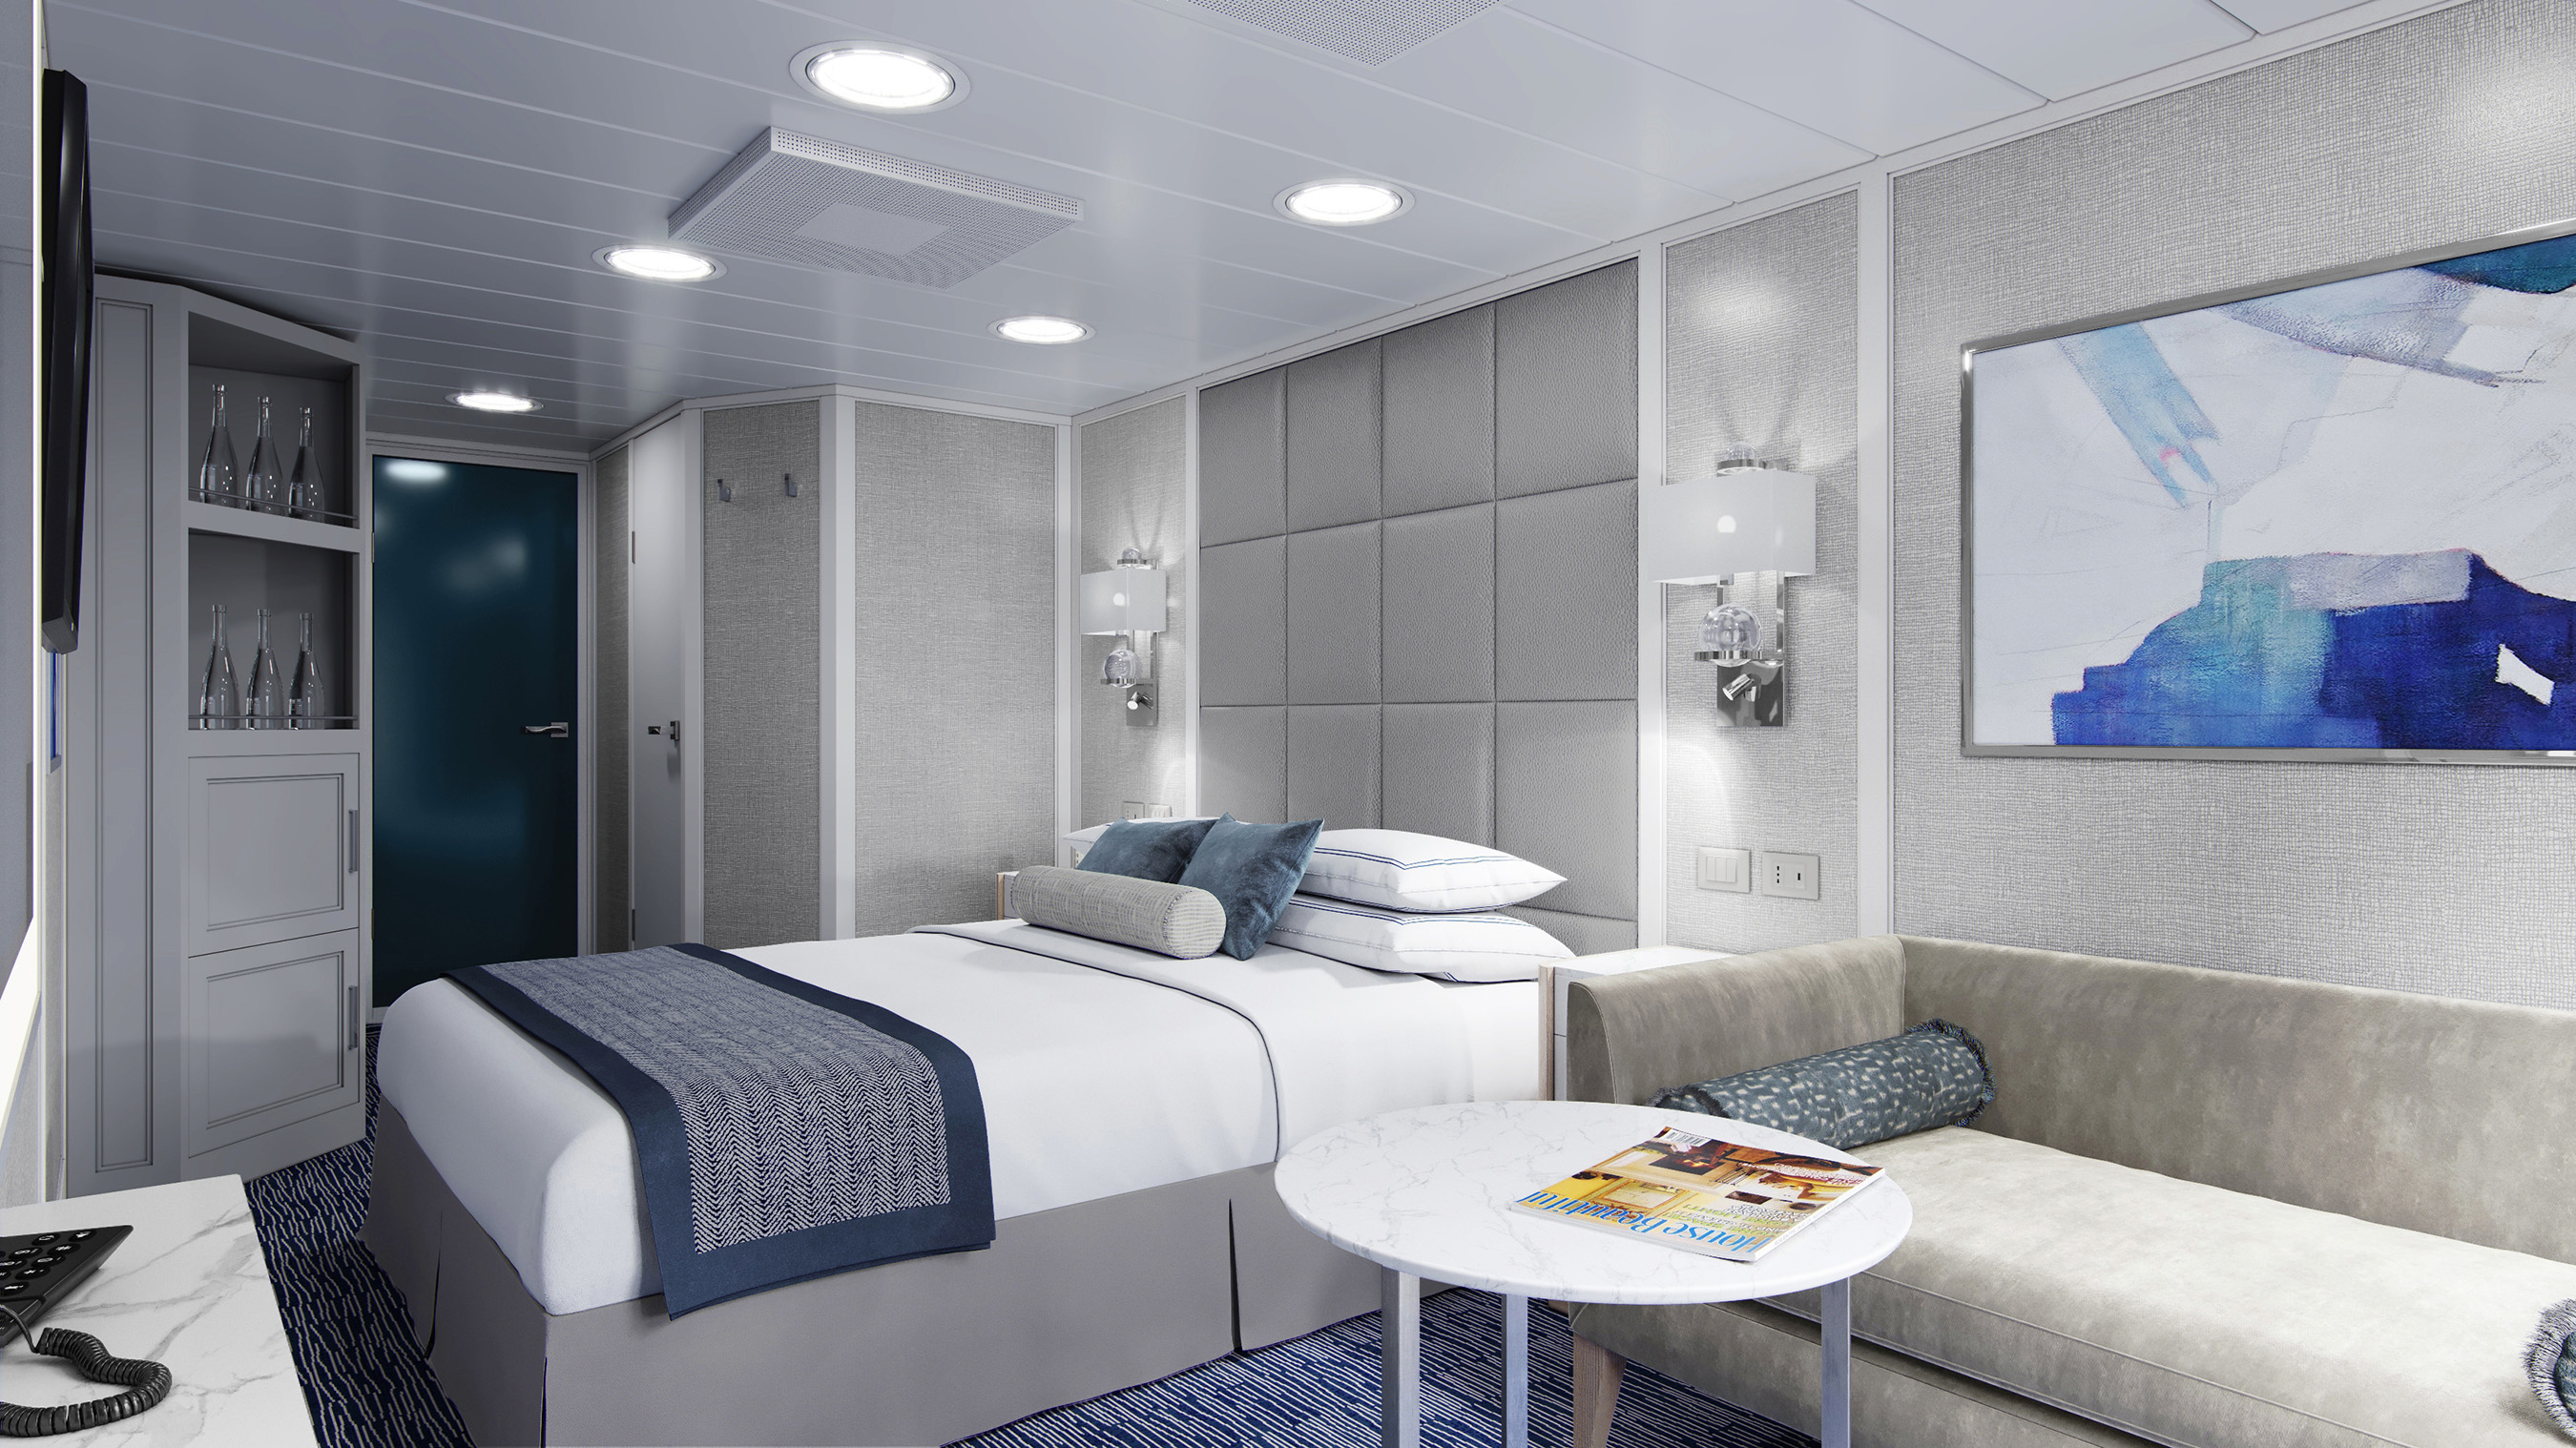 Concierge Veranda Stateroom of the reimagined Regatta-Class ships